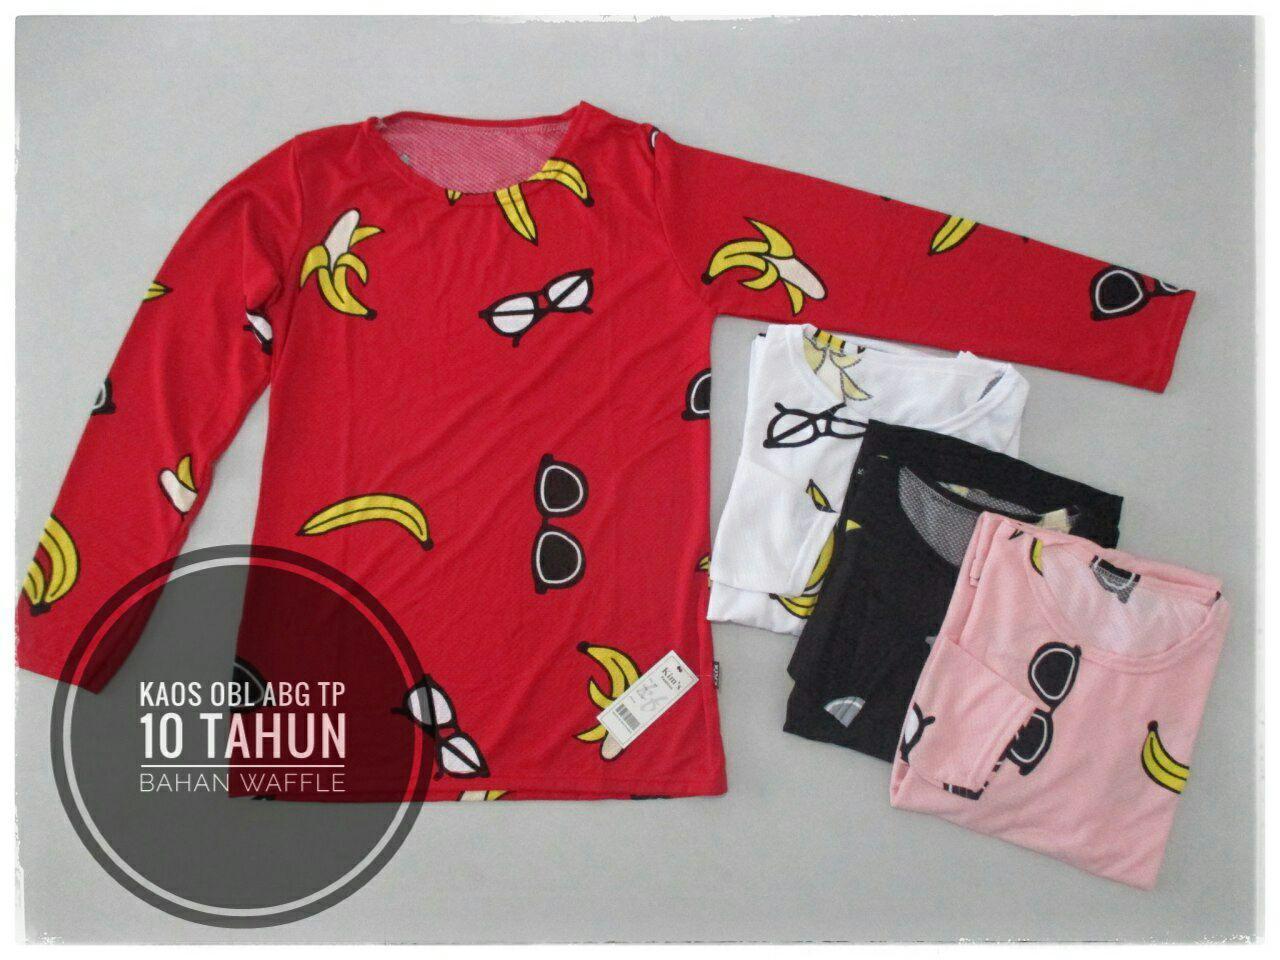 ObralanBaju.com Obral Baju Pakaian Murah Meriah 5000 Kaos Oblong ABG TP